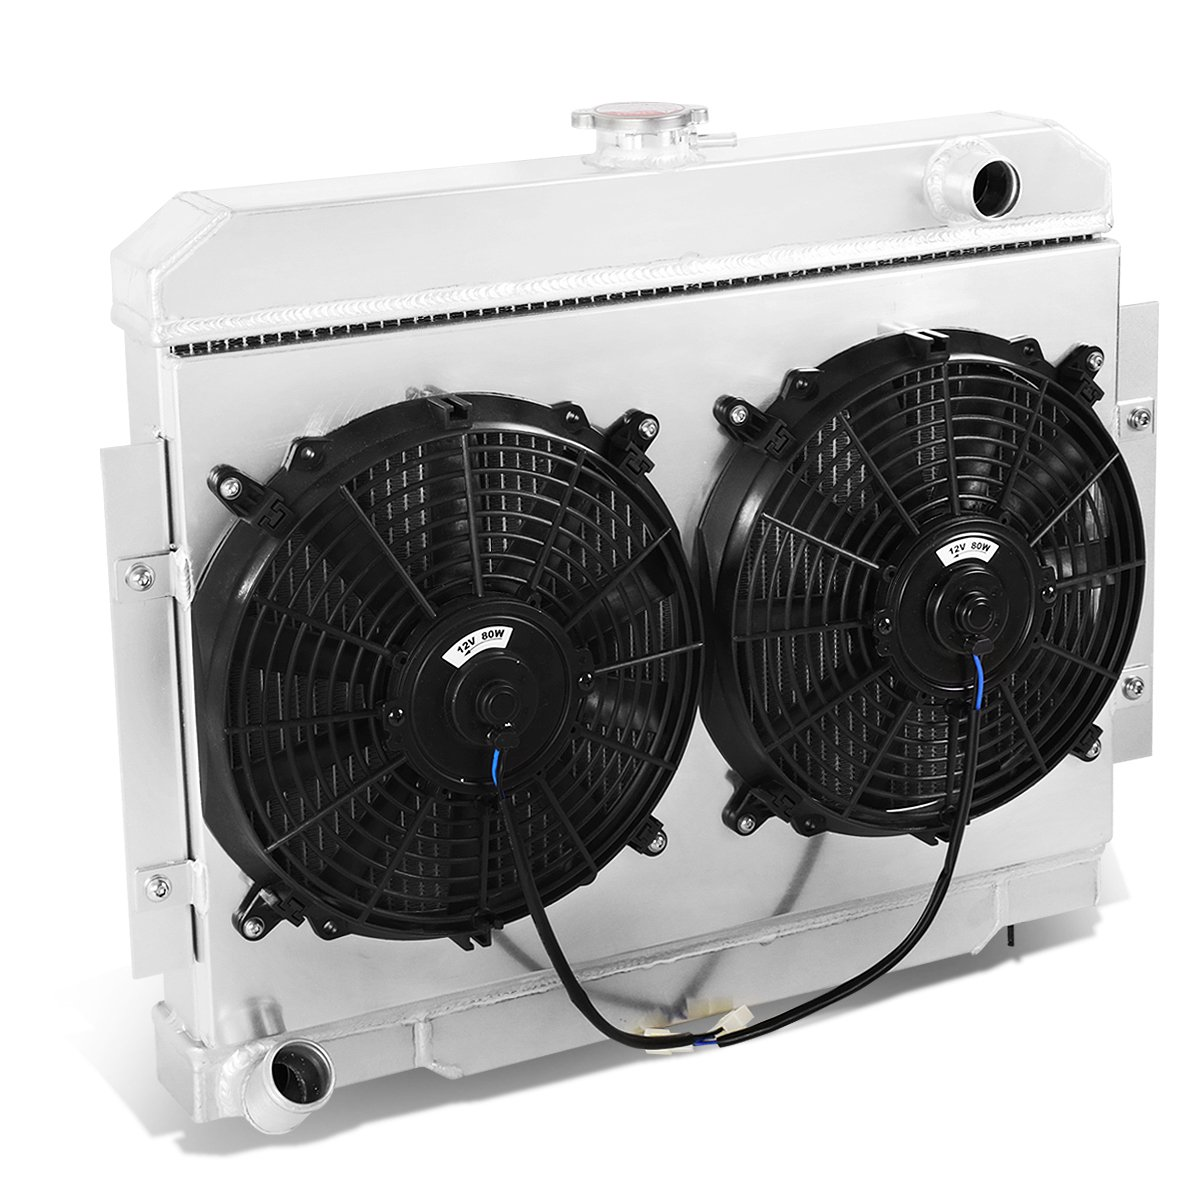 DNA Motoring RA+FS-JEEP73-3 3-Row Aluminum Radiator with Fan Shroud